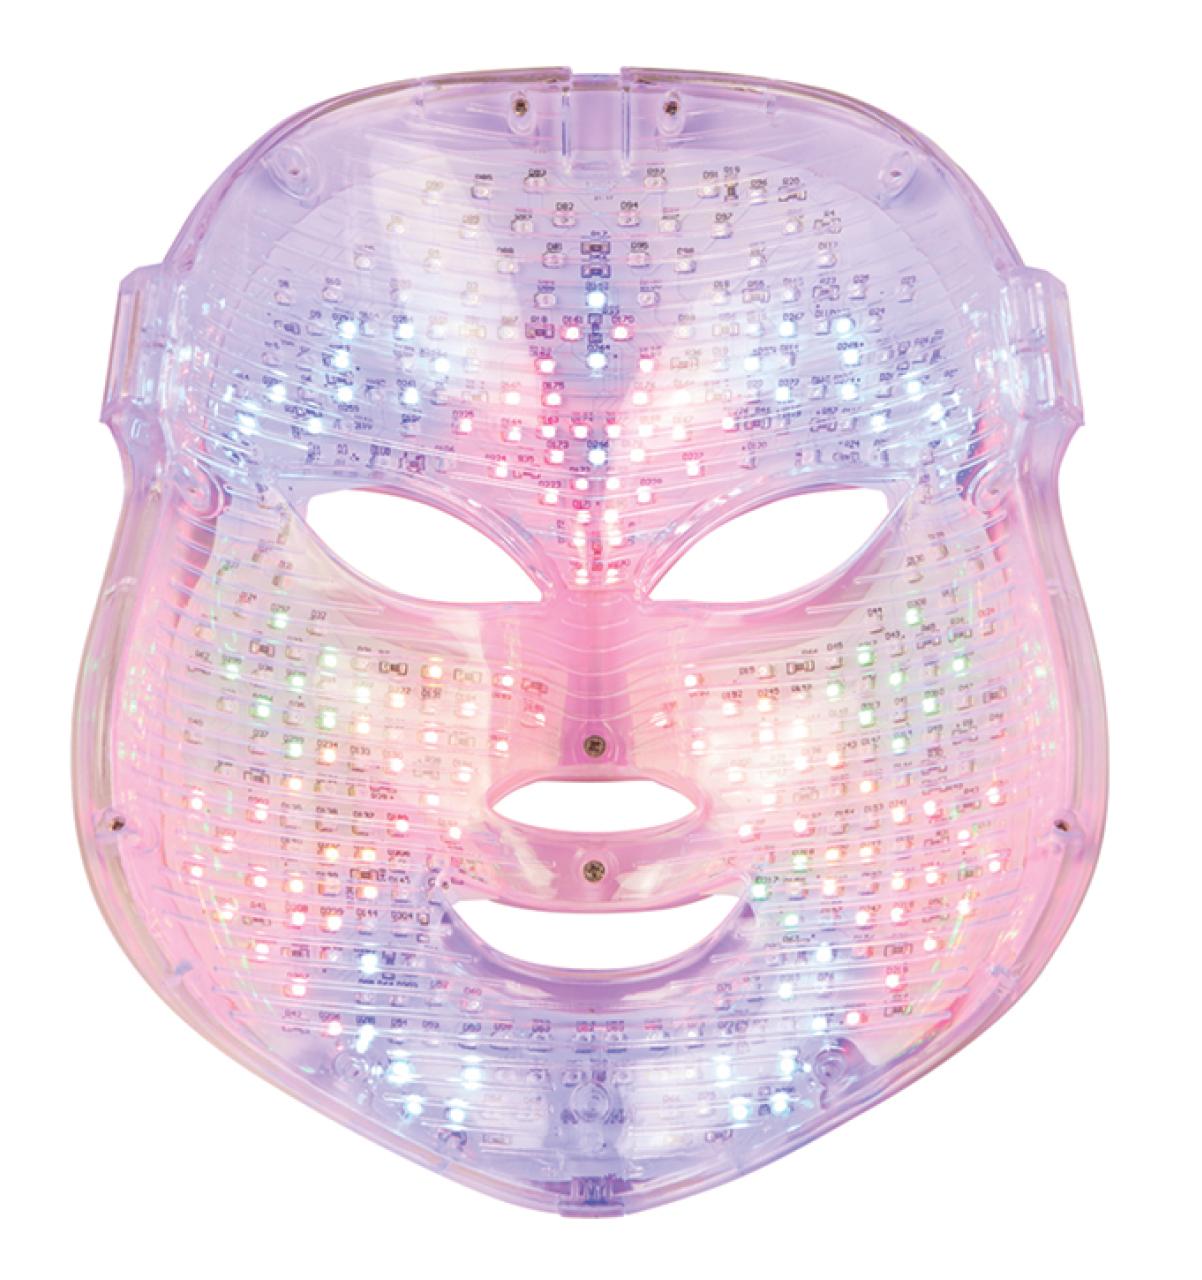 ledsmedical mask characteristics_english